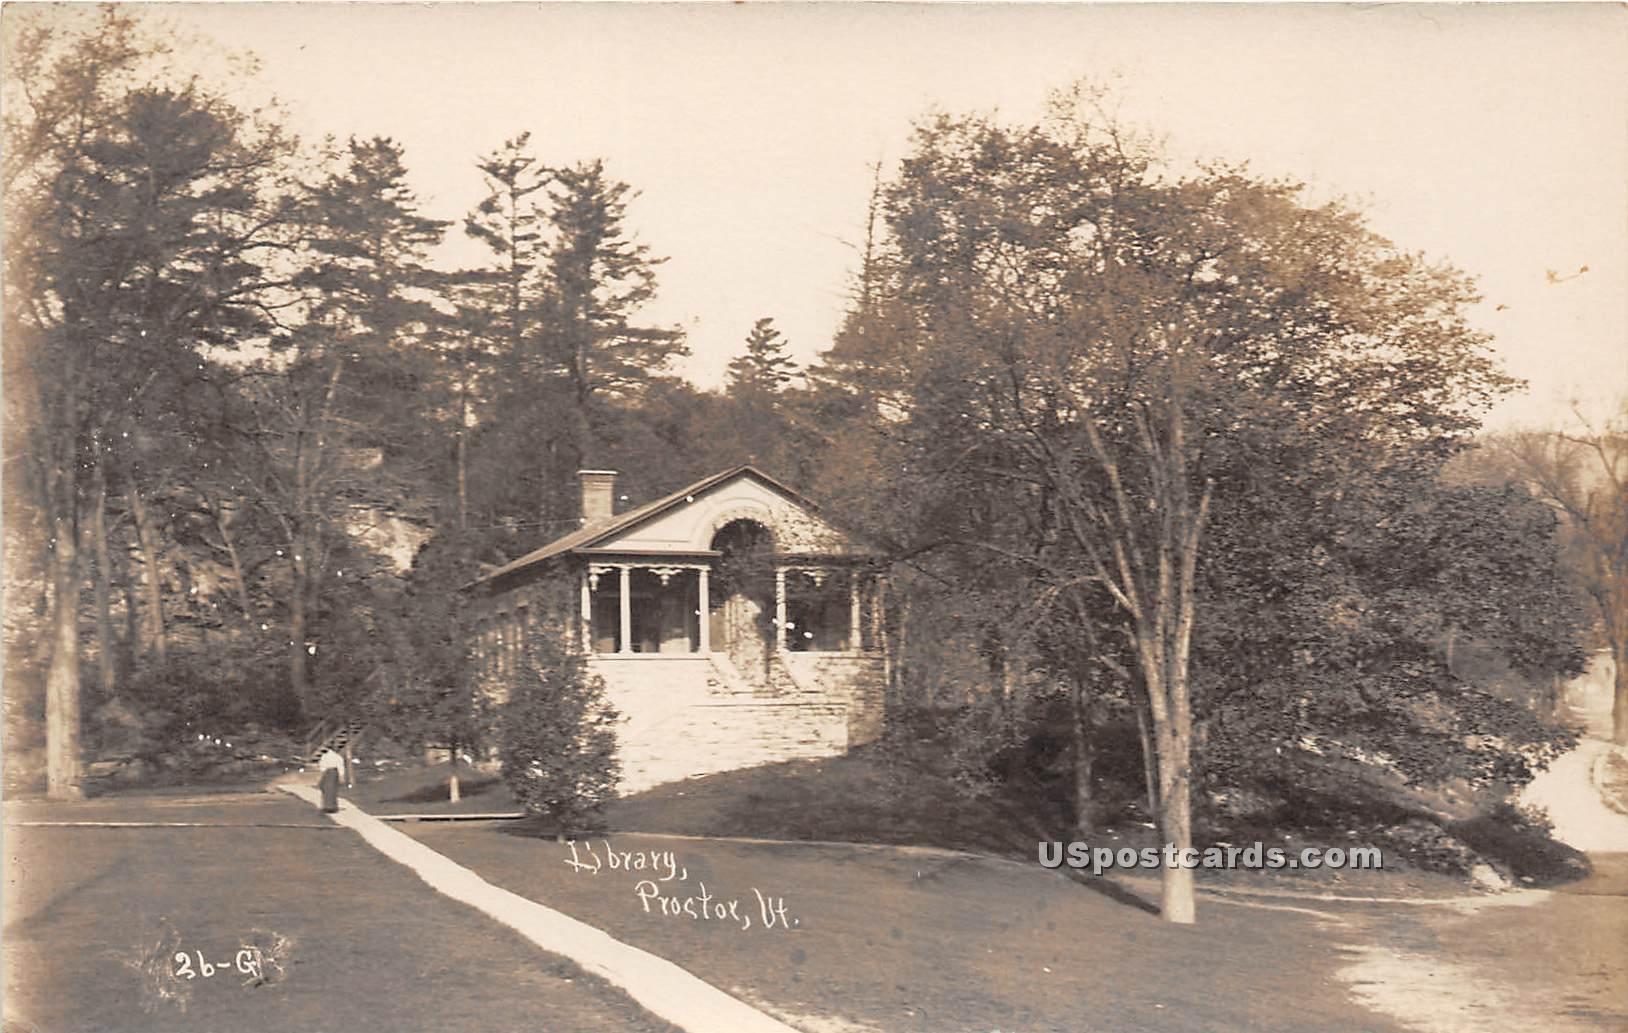 Library - Proctor, Vermont VT Postcard